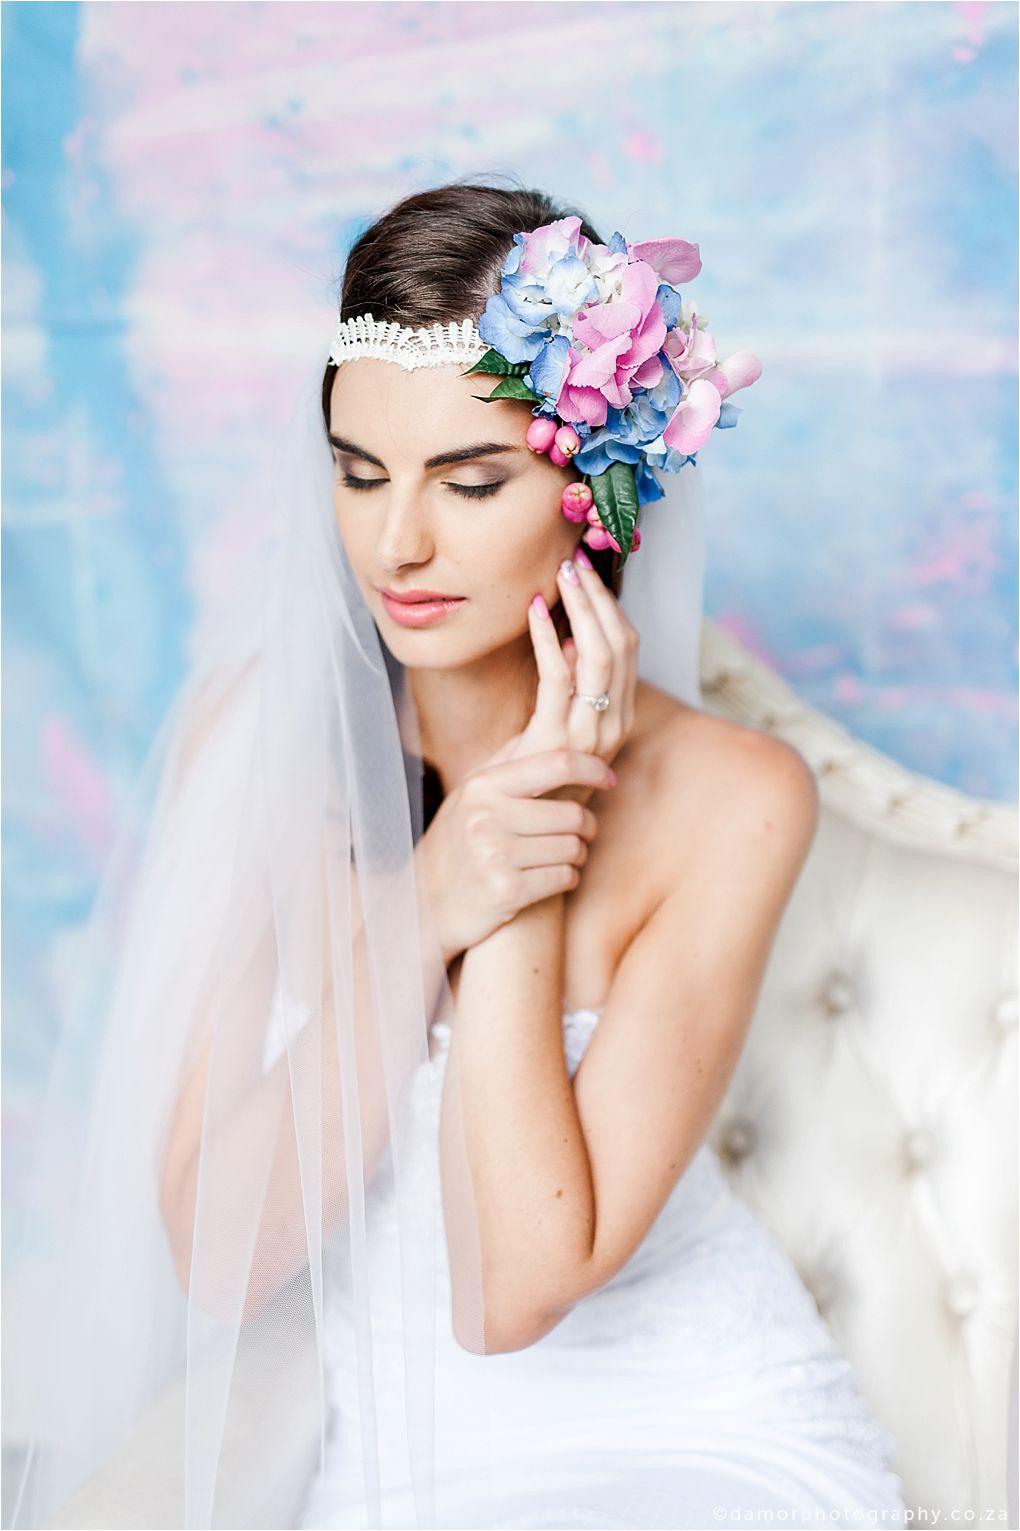 D'Amor Photography - Editorial Photo Shoot Pantone 2016 19